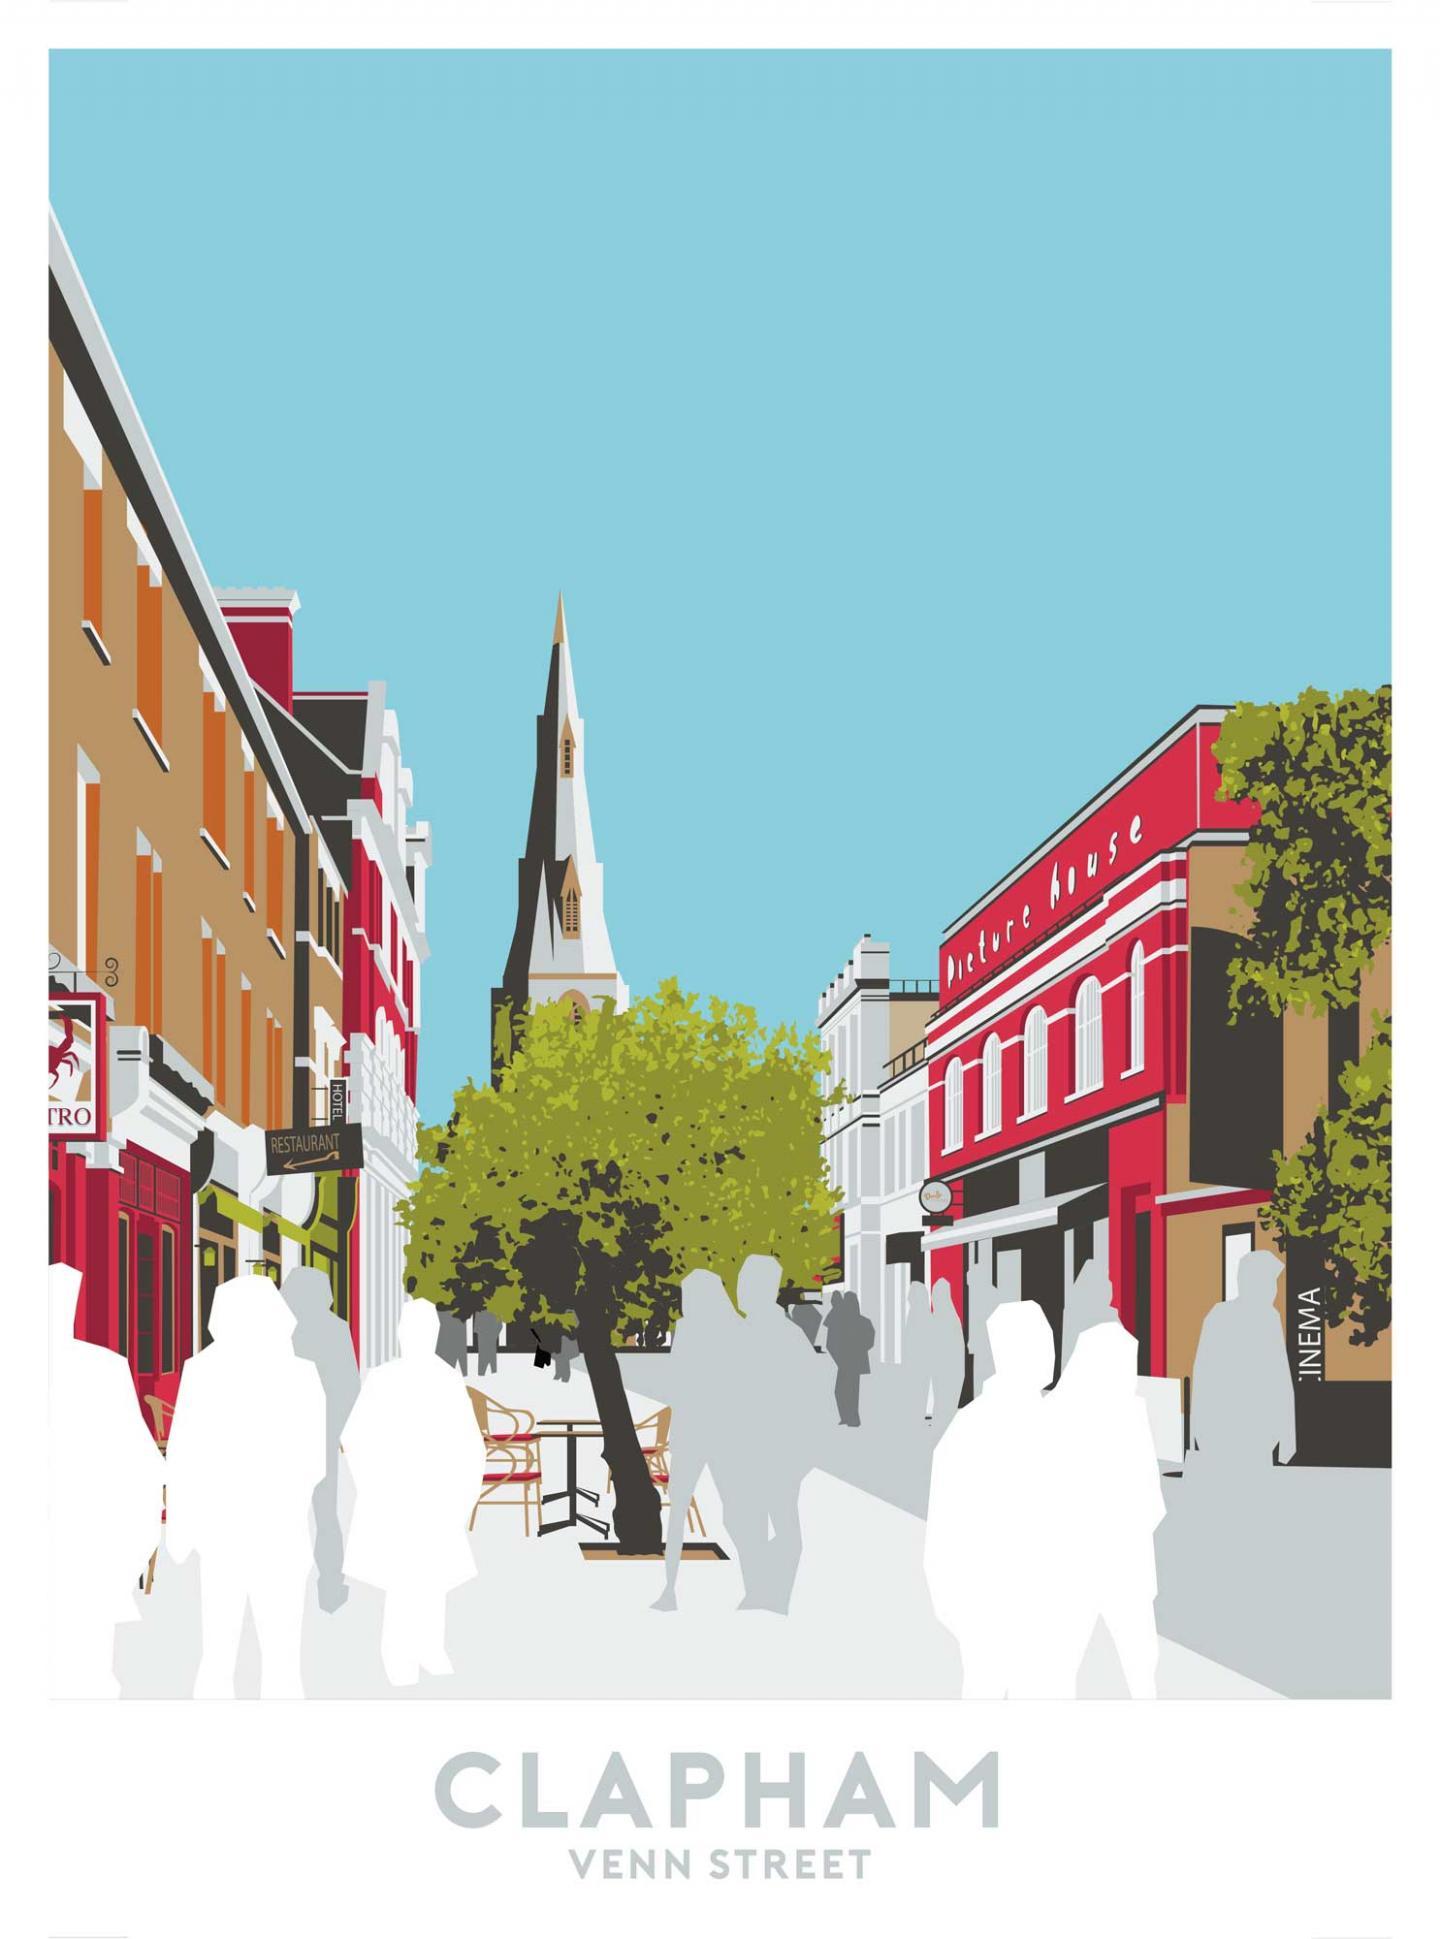 Place in Print Venn Street, Clapham Travel Poster Art Print